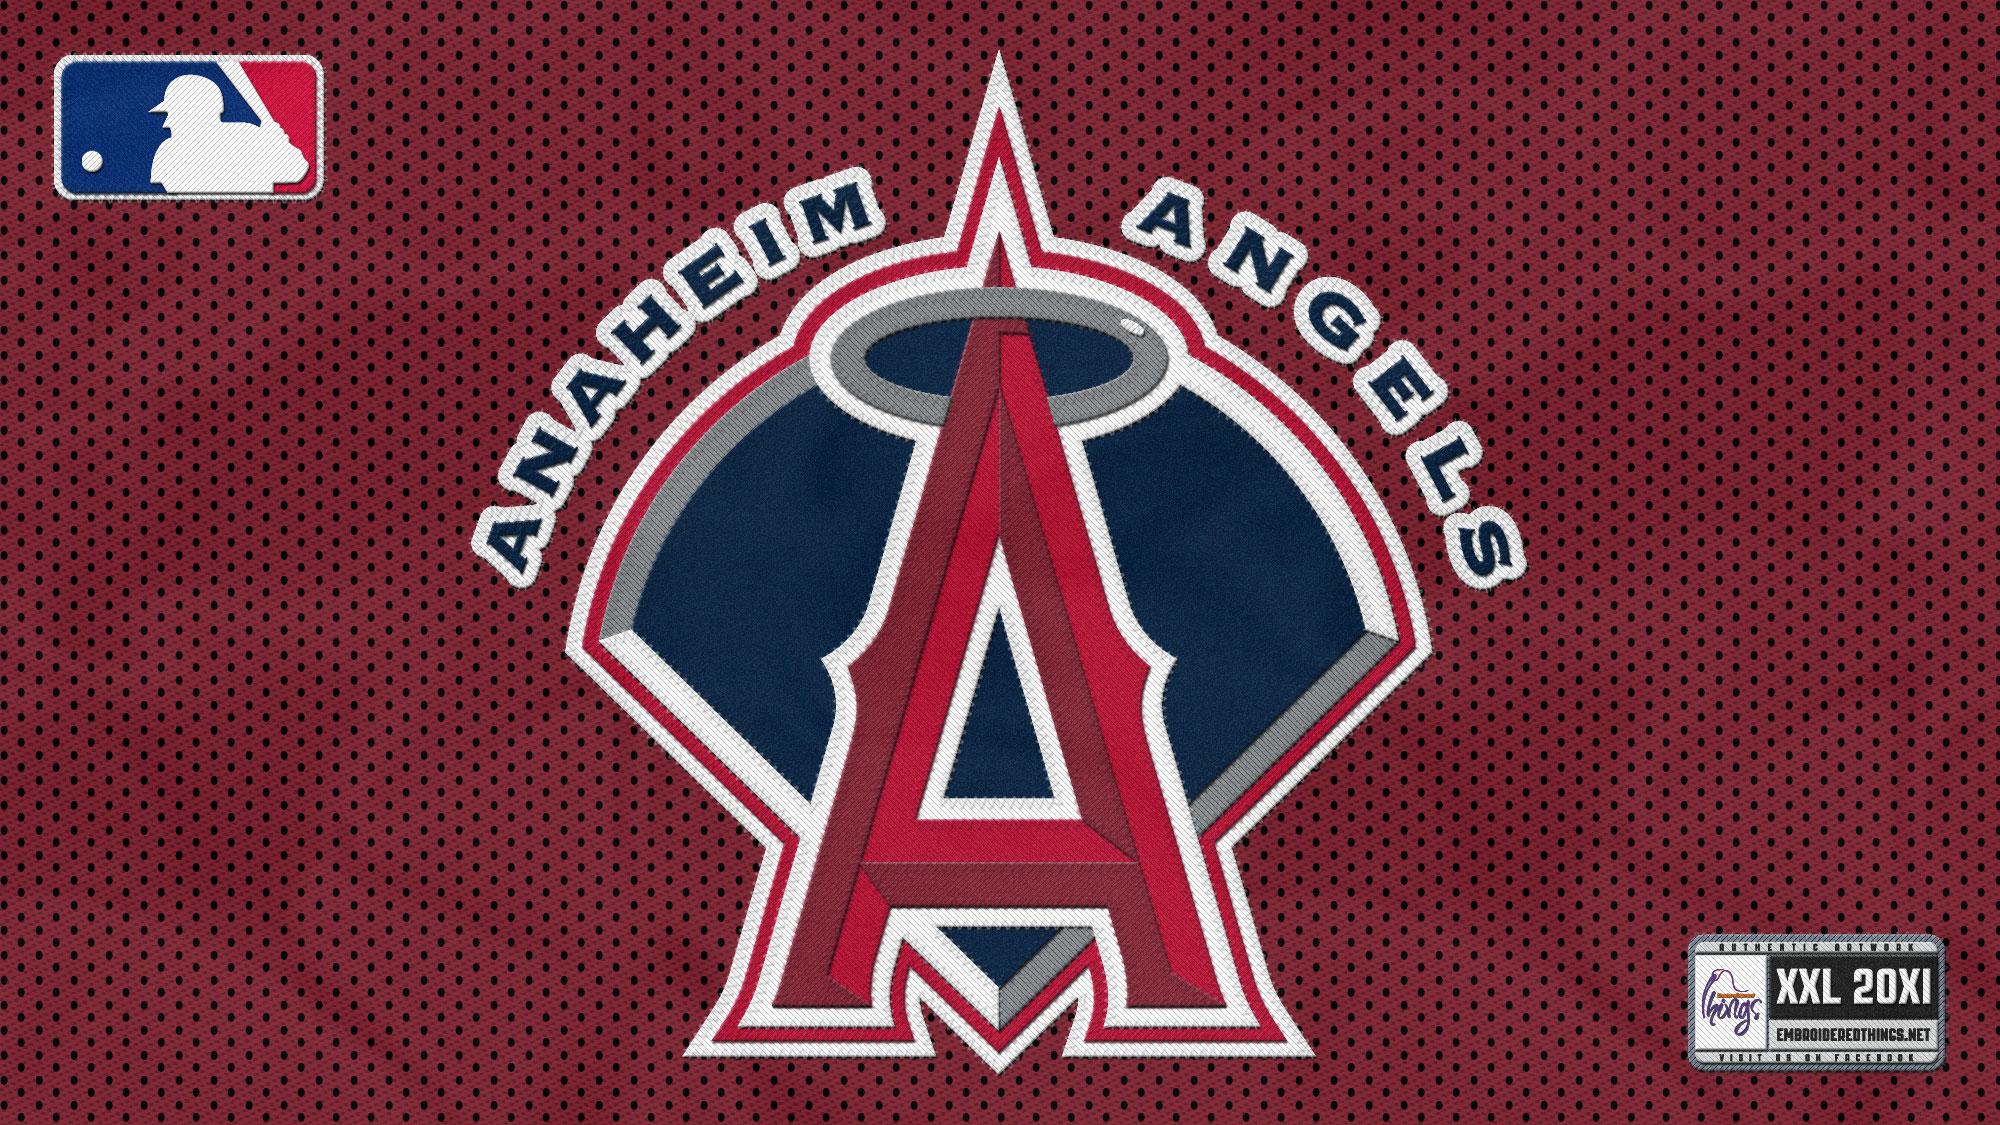 ANAHEIM ANGELS baseball mlb fw wallpaper 2000x1125 158473 2000x1125